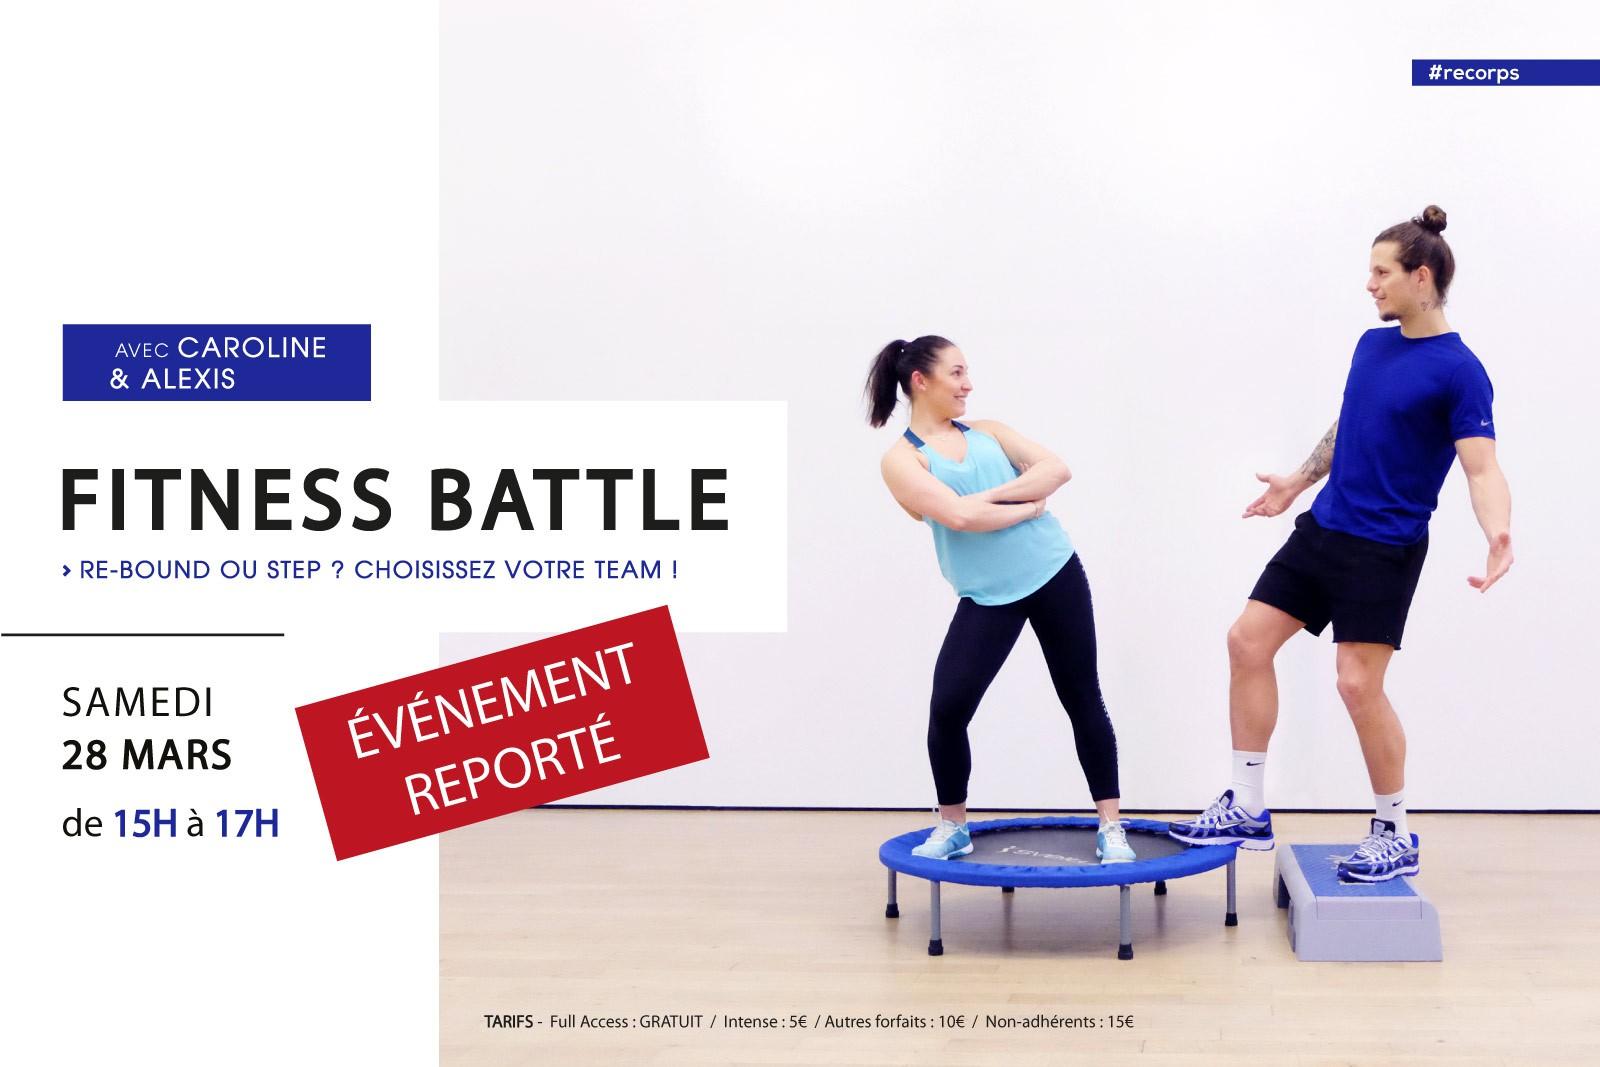 FITNESS BATTLE : RE-BOUND VS STEP